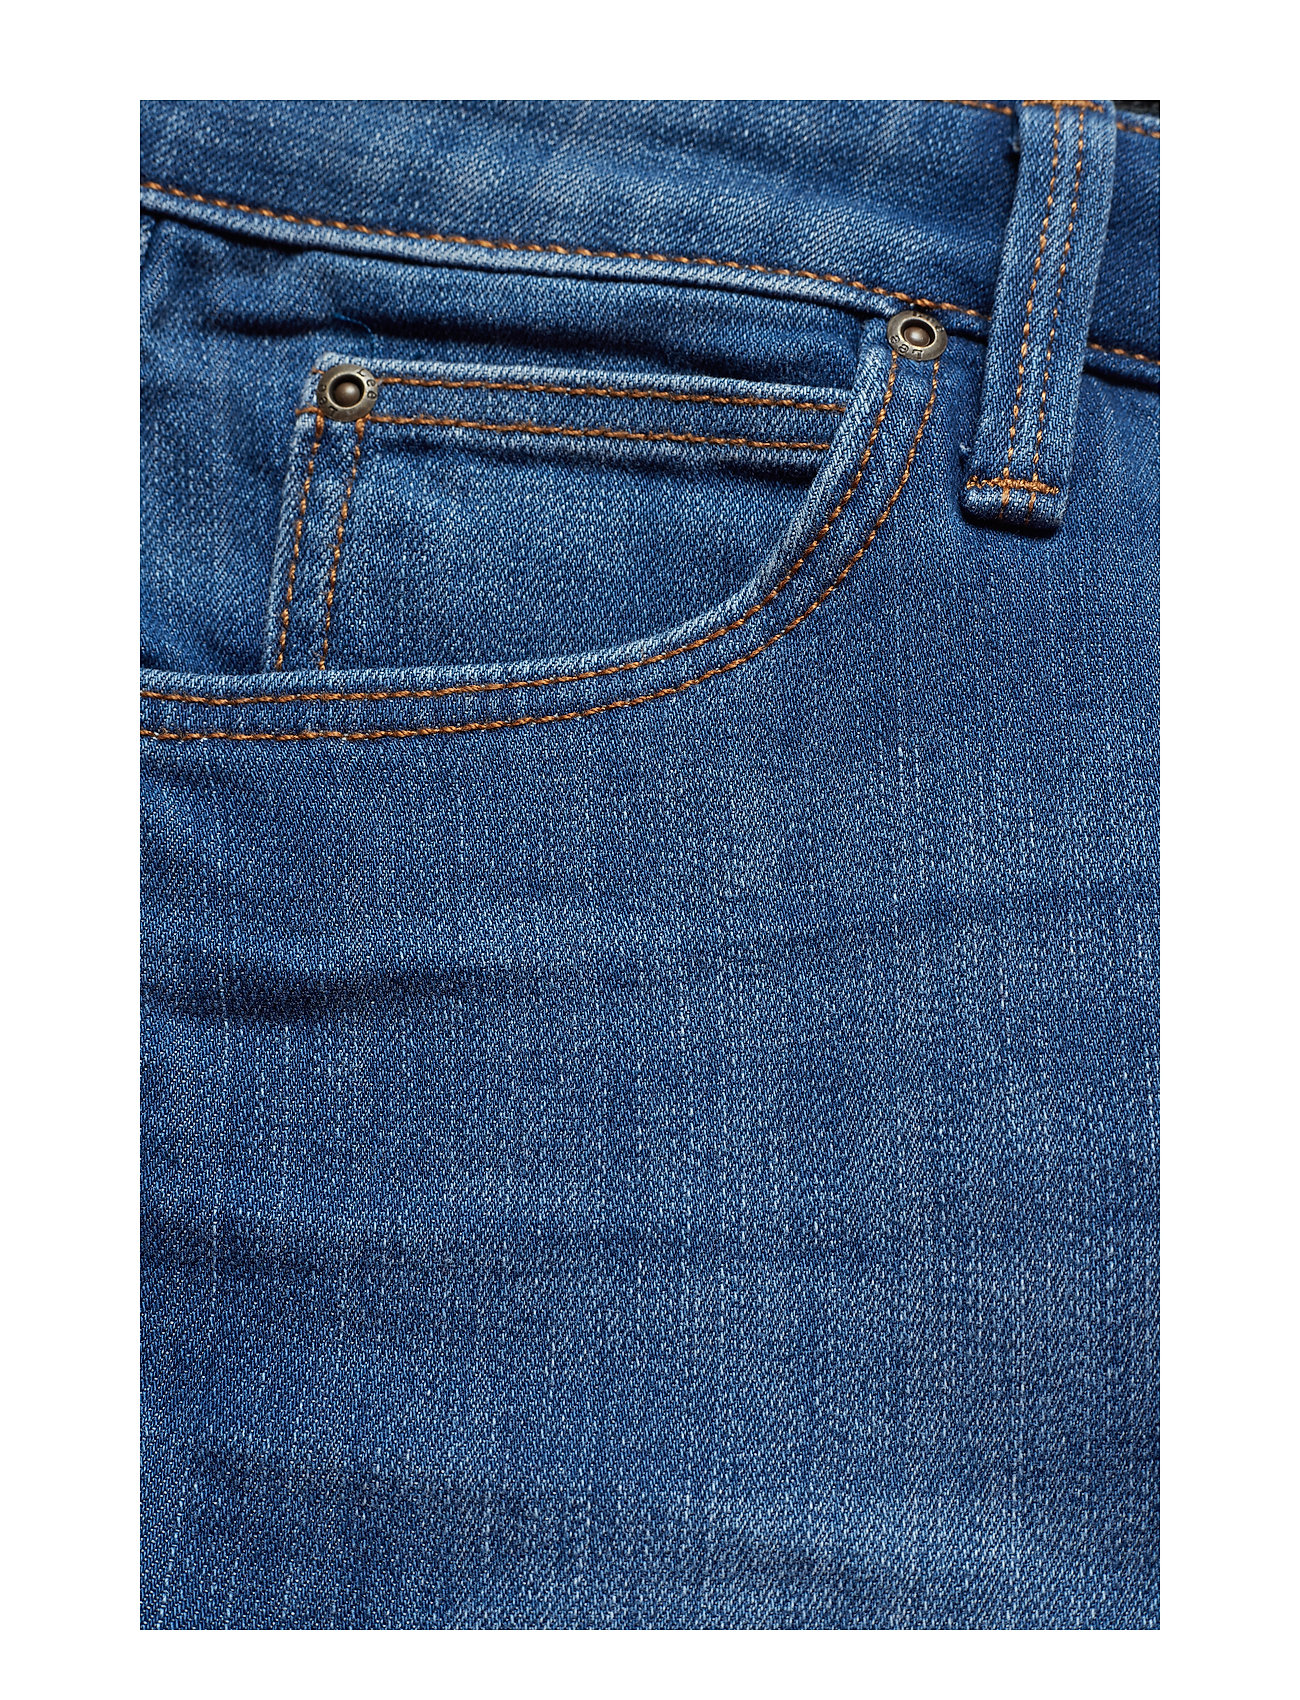 Lee Jeans - SCARLETT CROPPED - slim jeans - high blue - 0